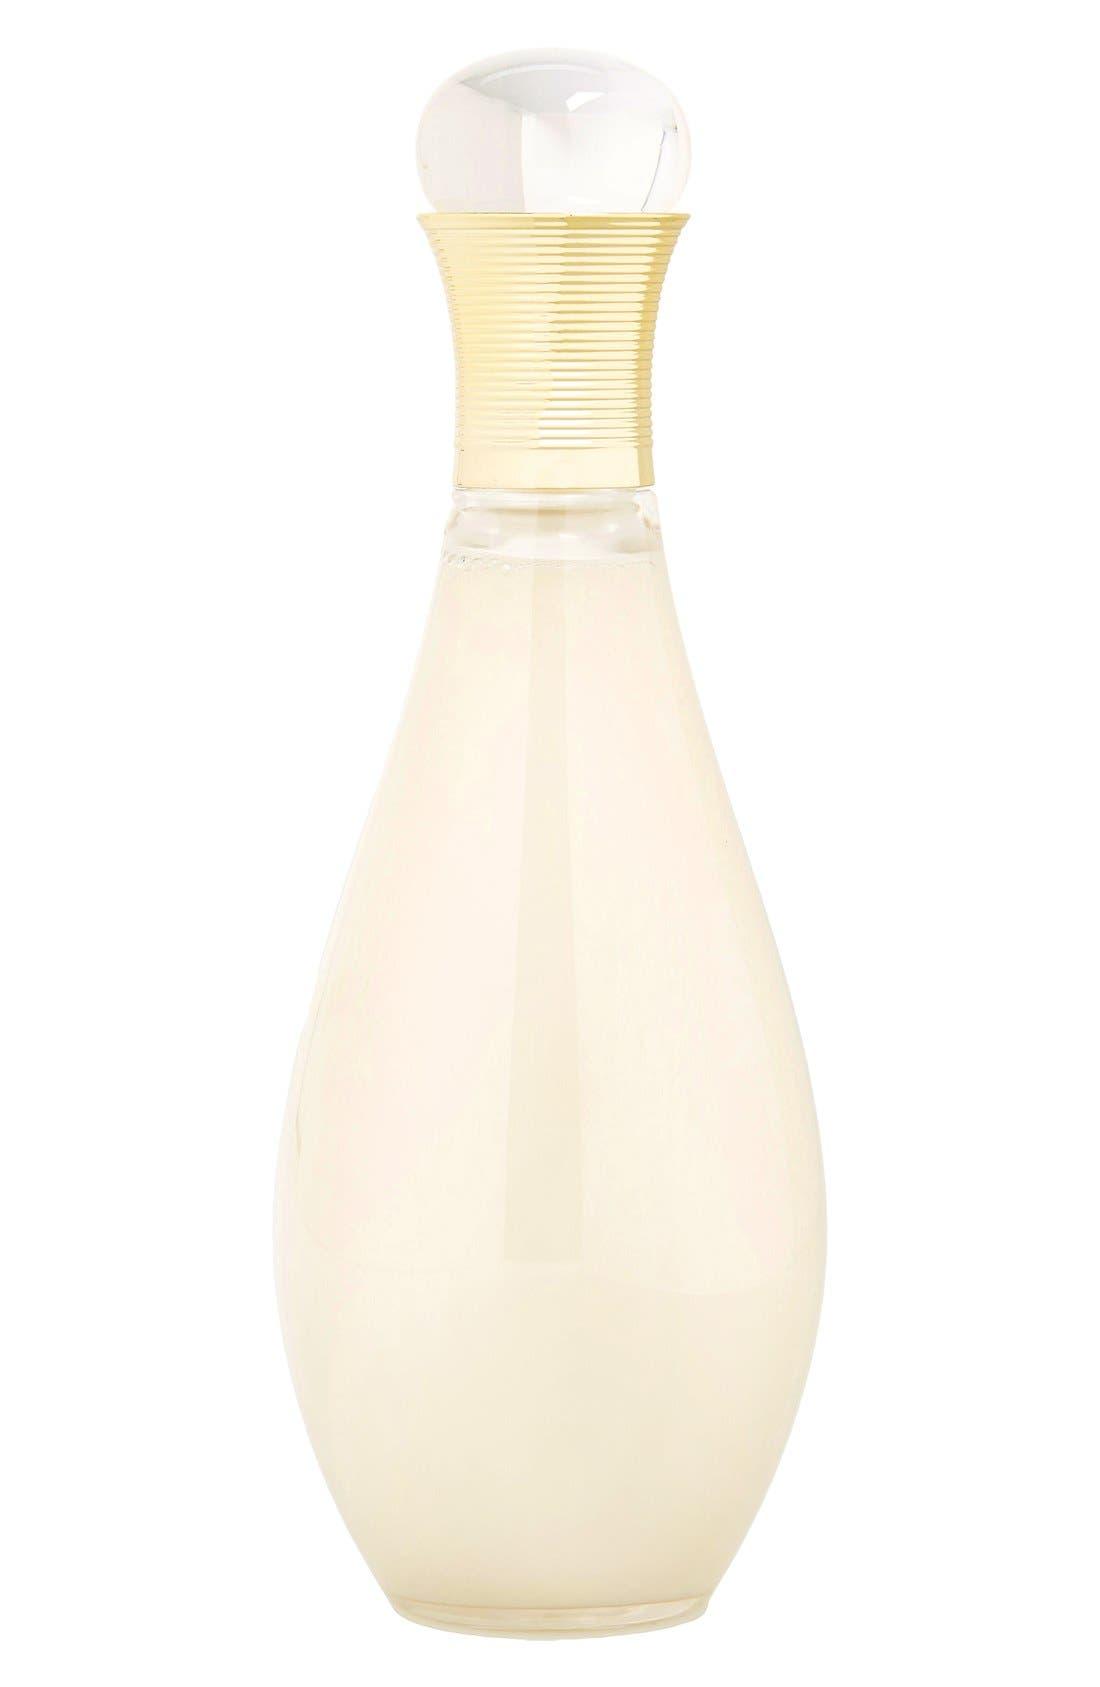 Dior 'J'adore' Creamy Shower Gel